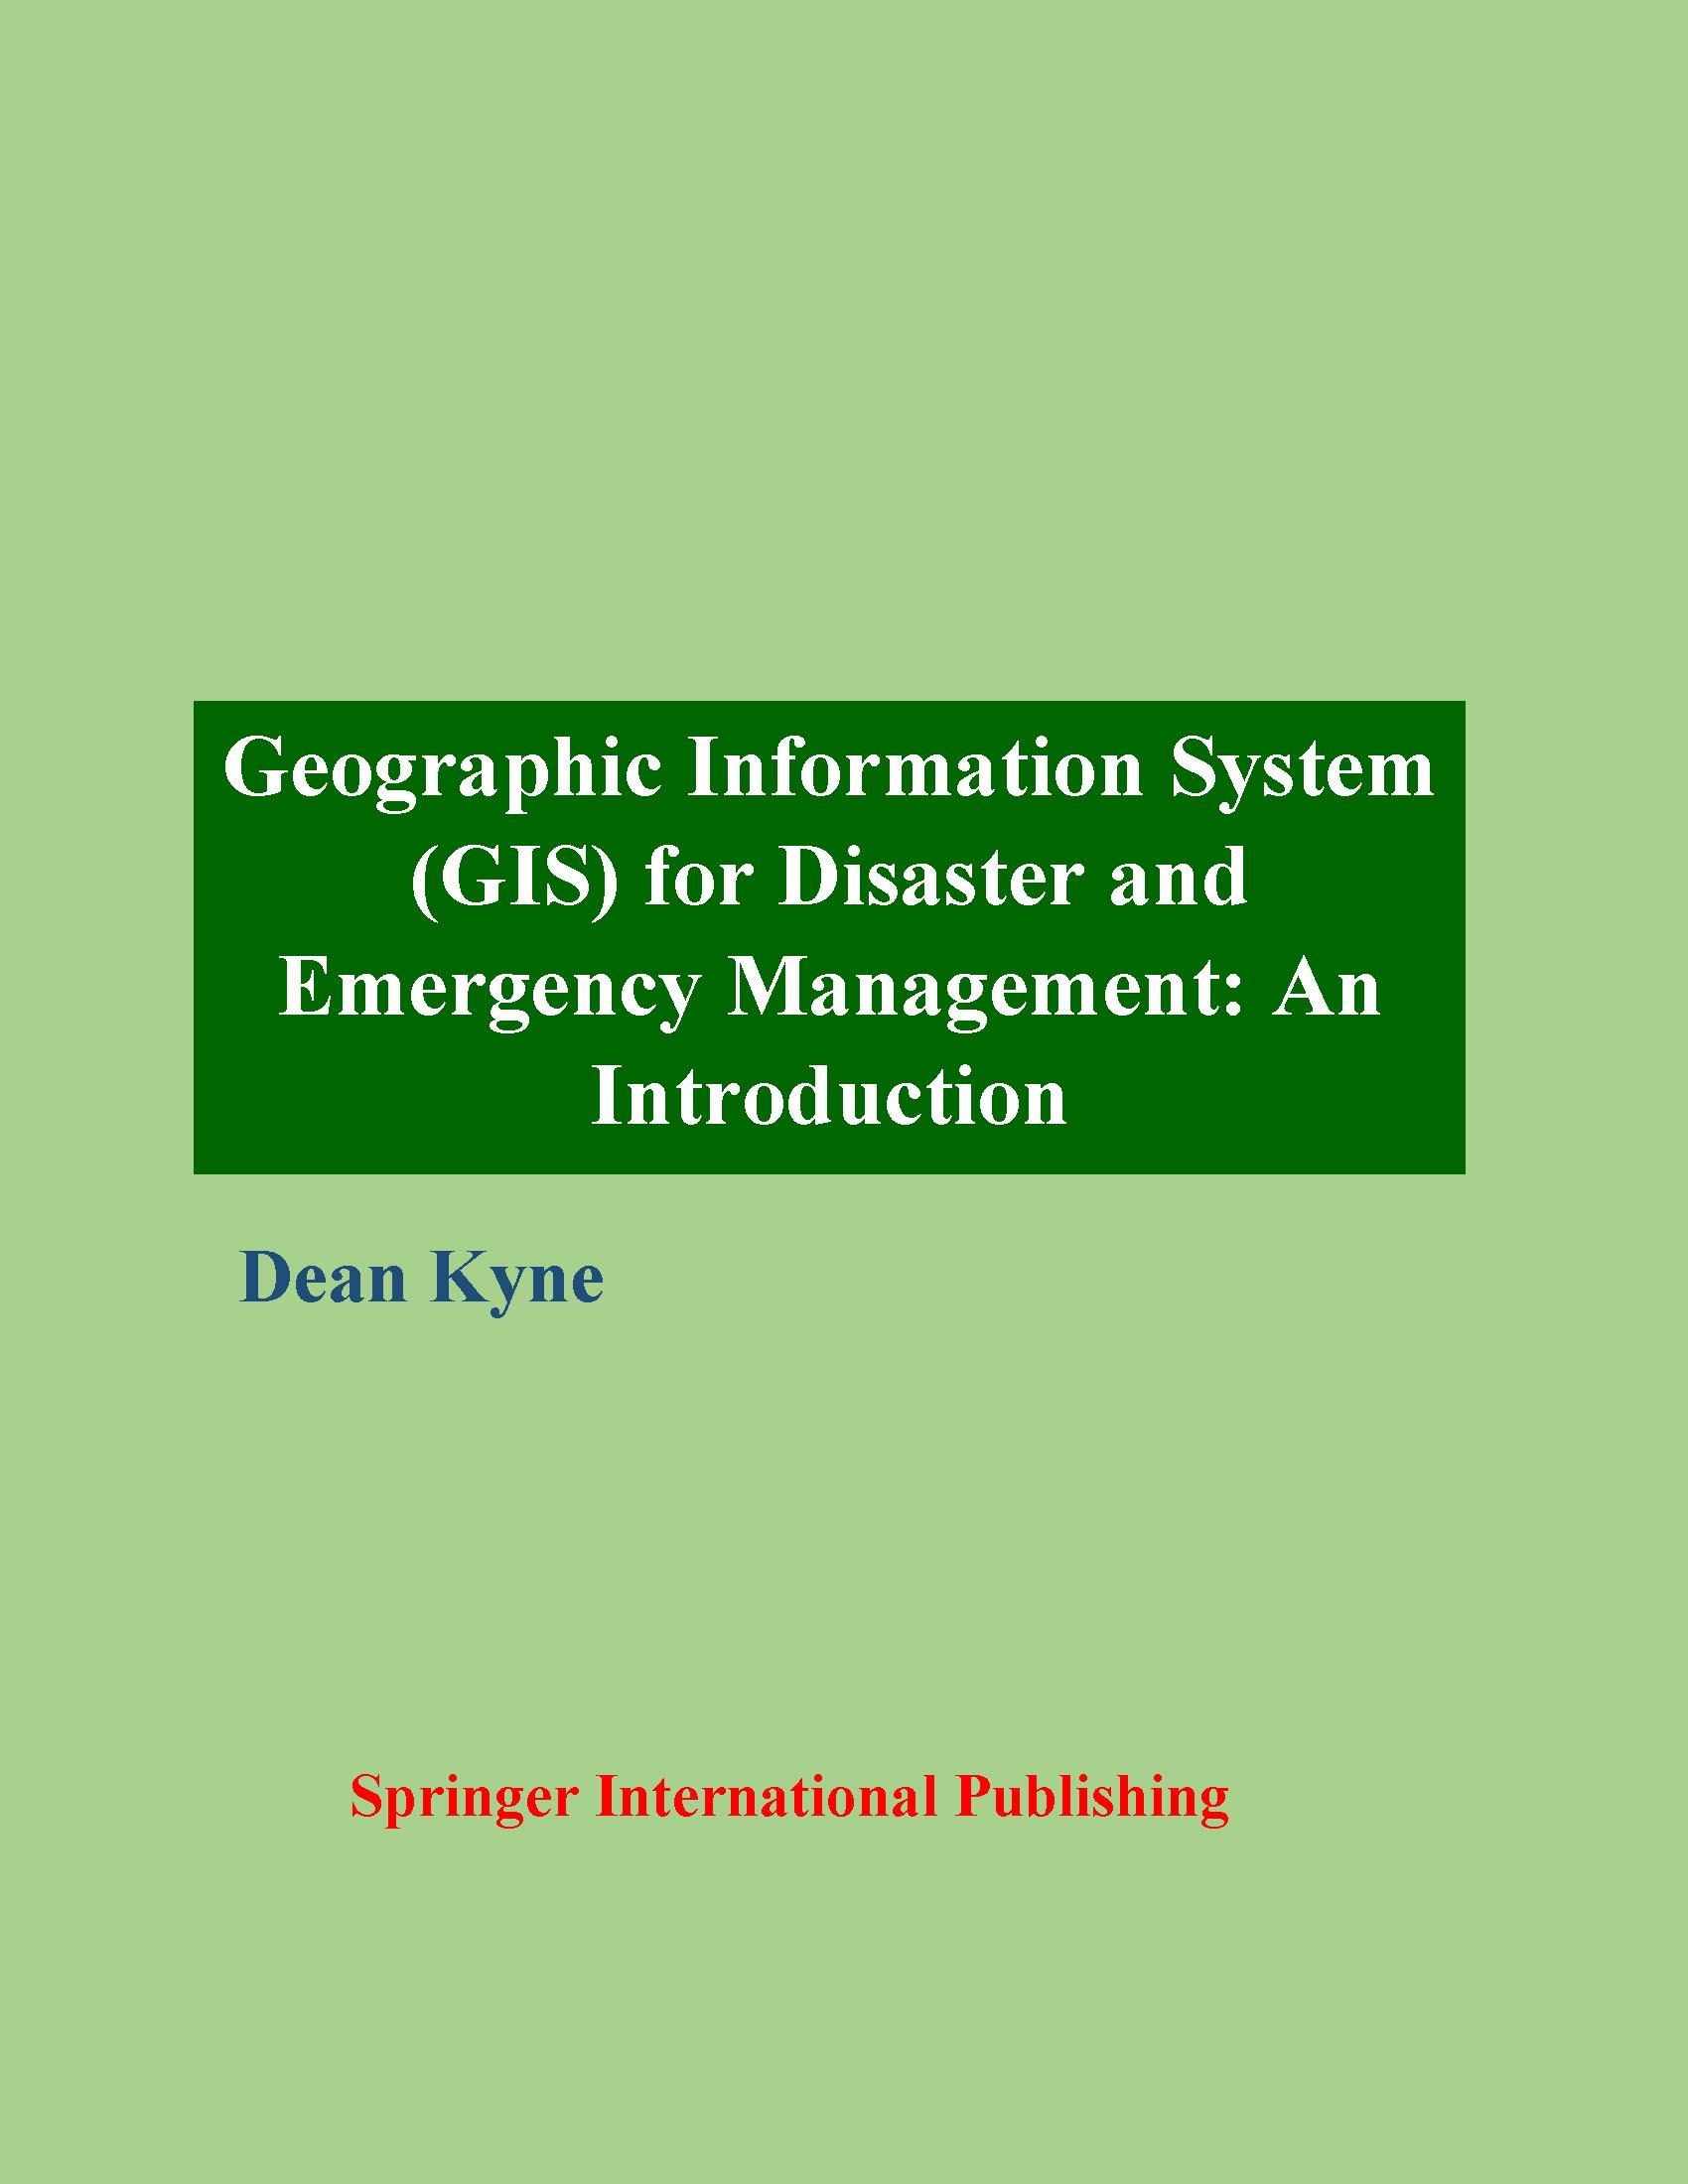 Book covers_GIS.jpg